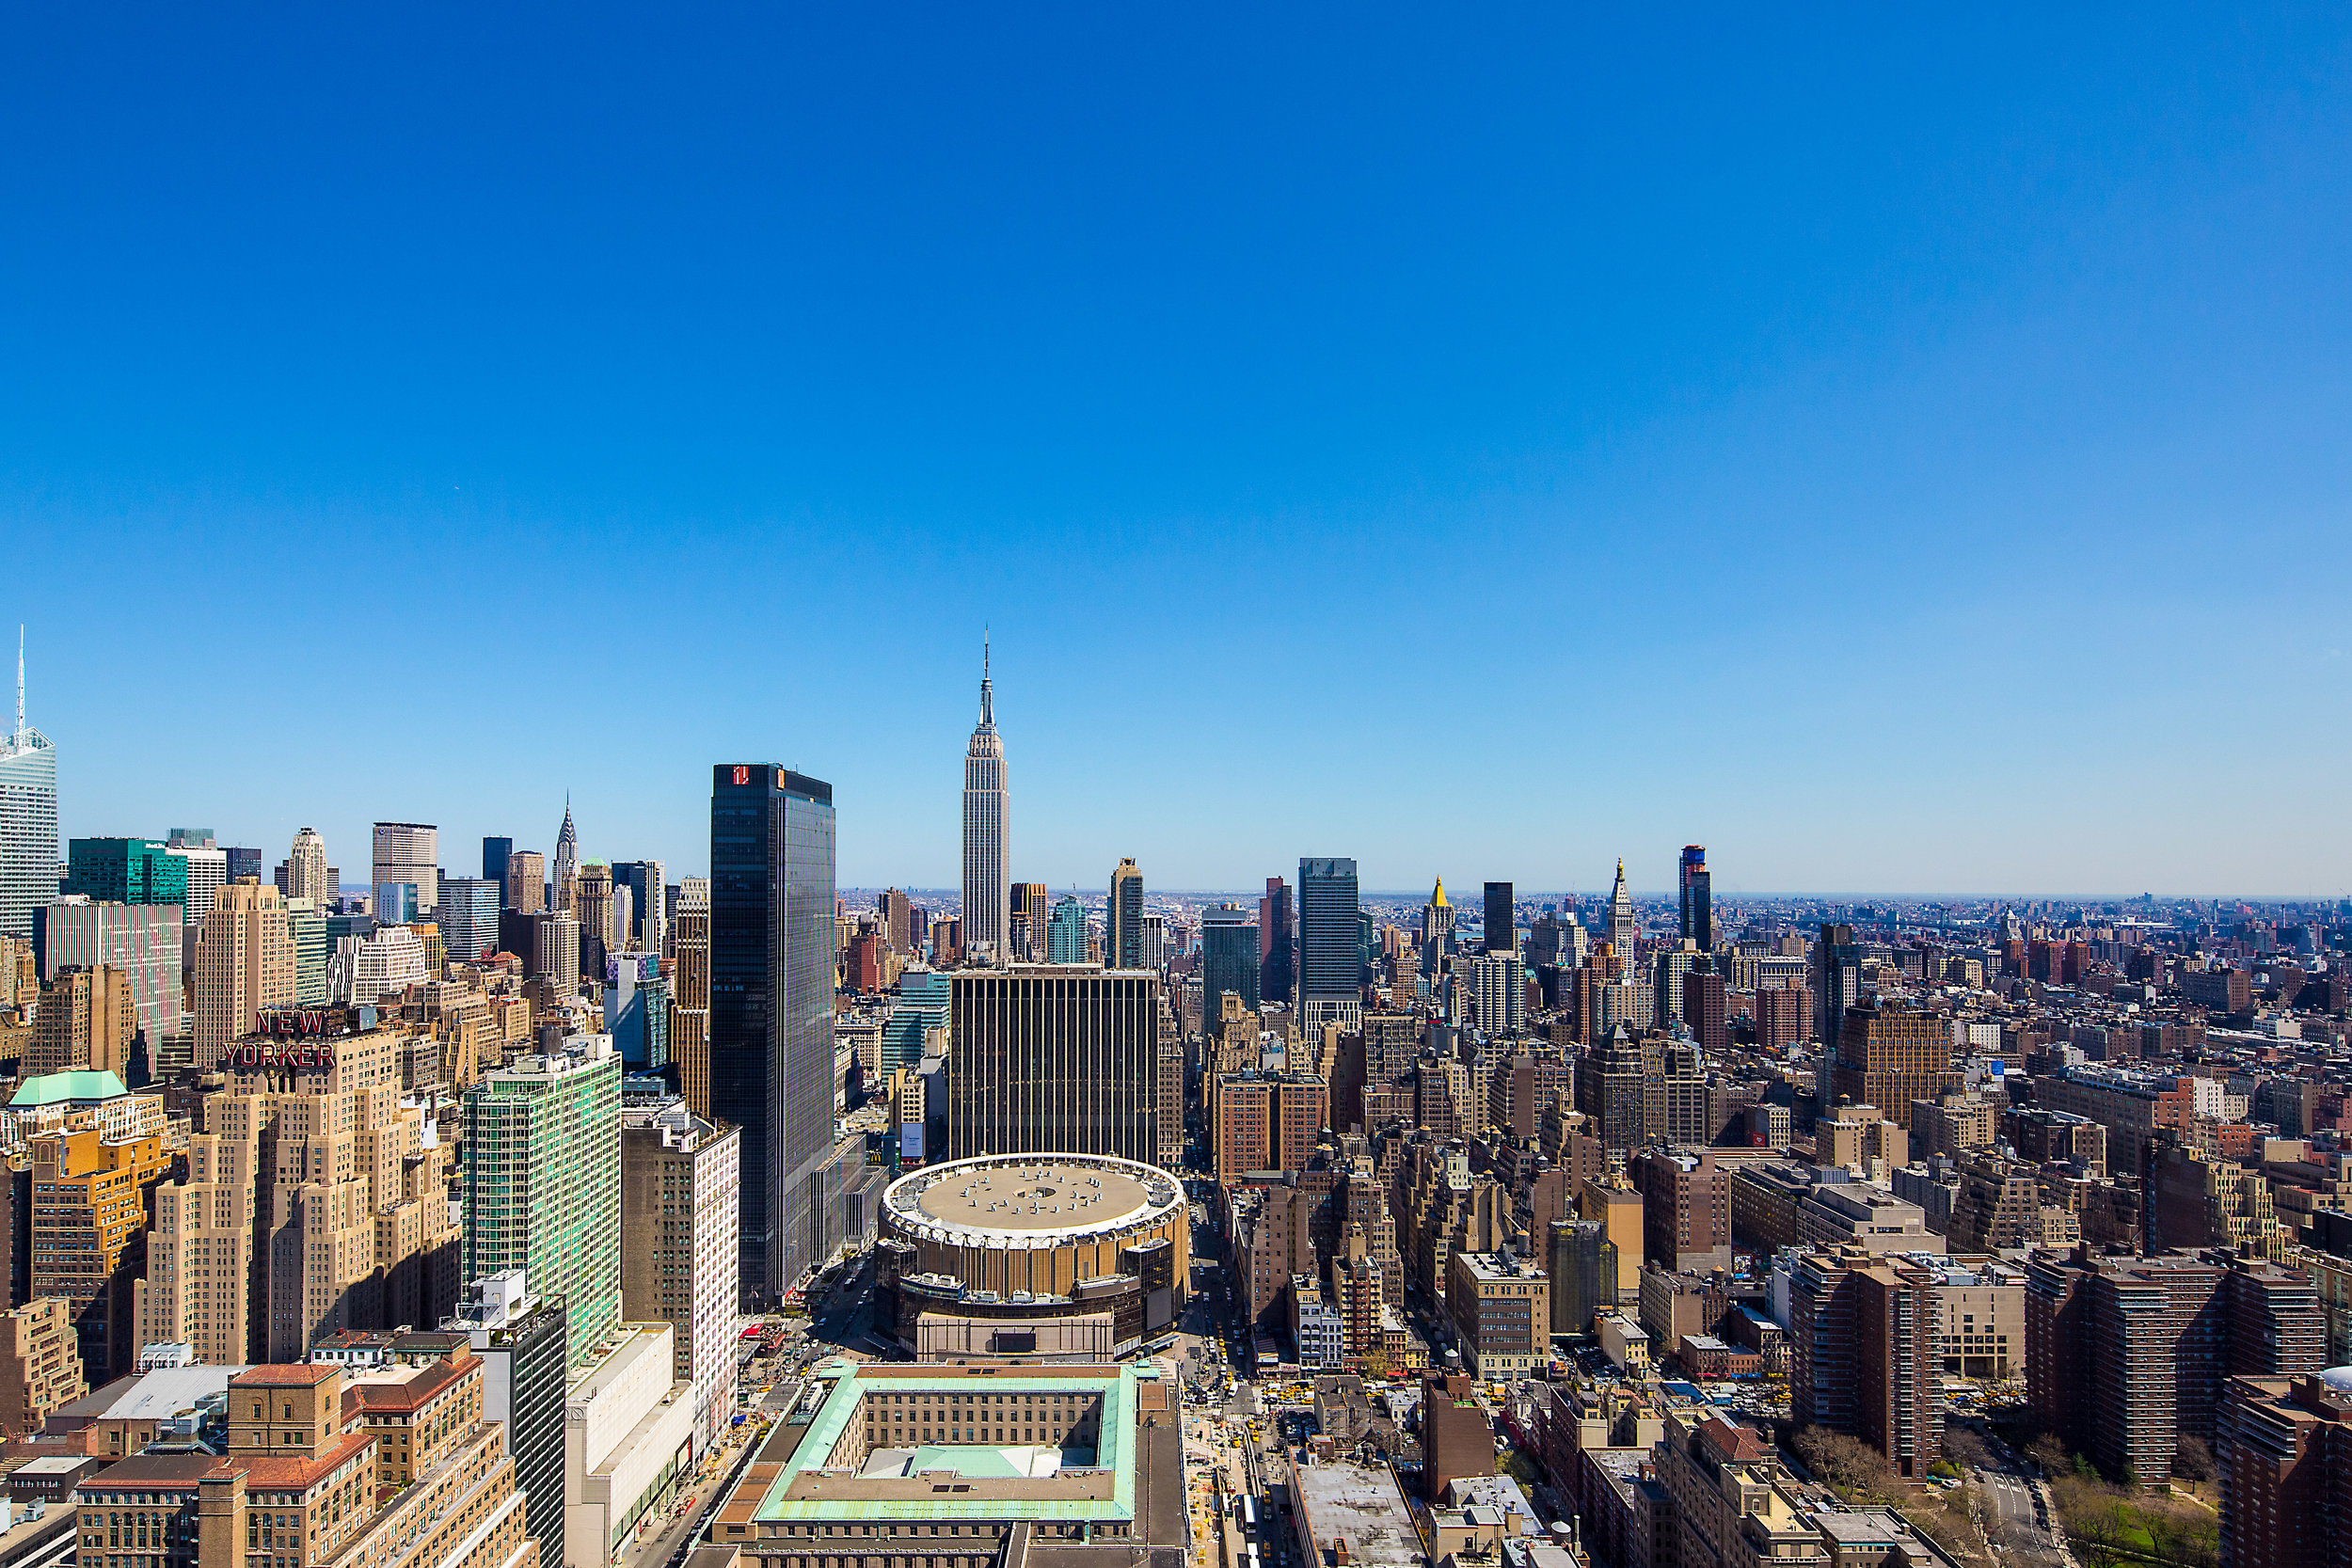 LSNY_City_Views-4.jpg